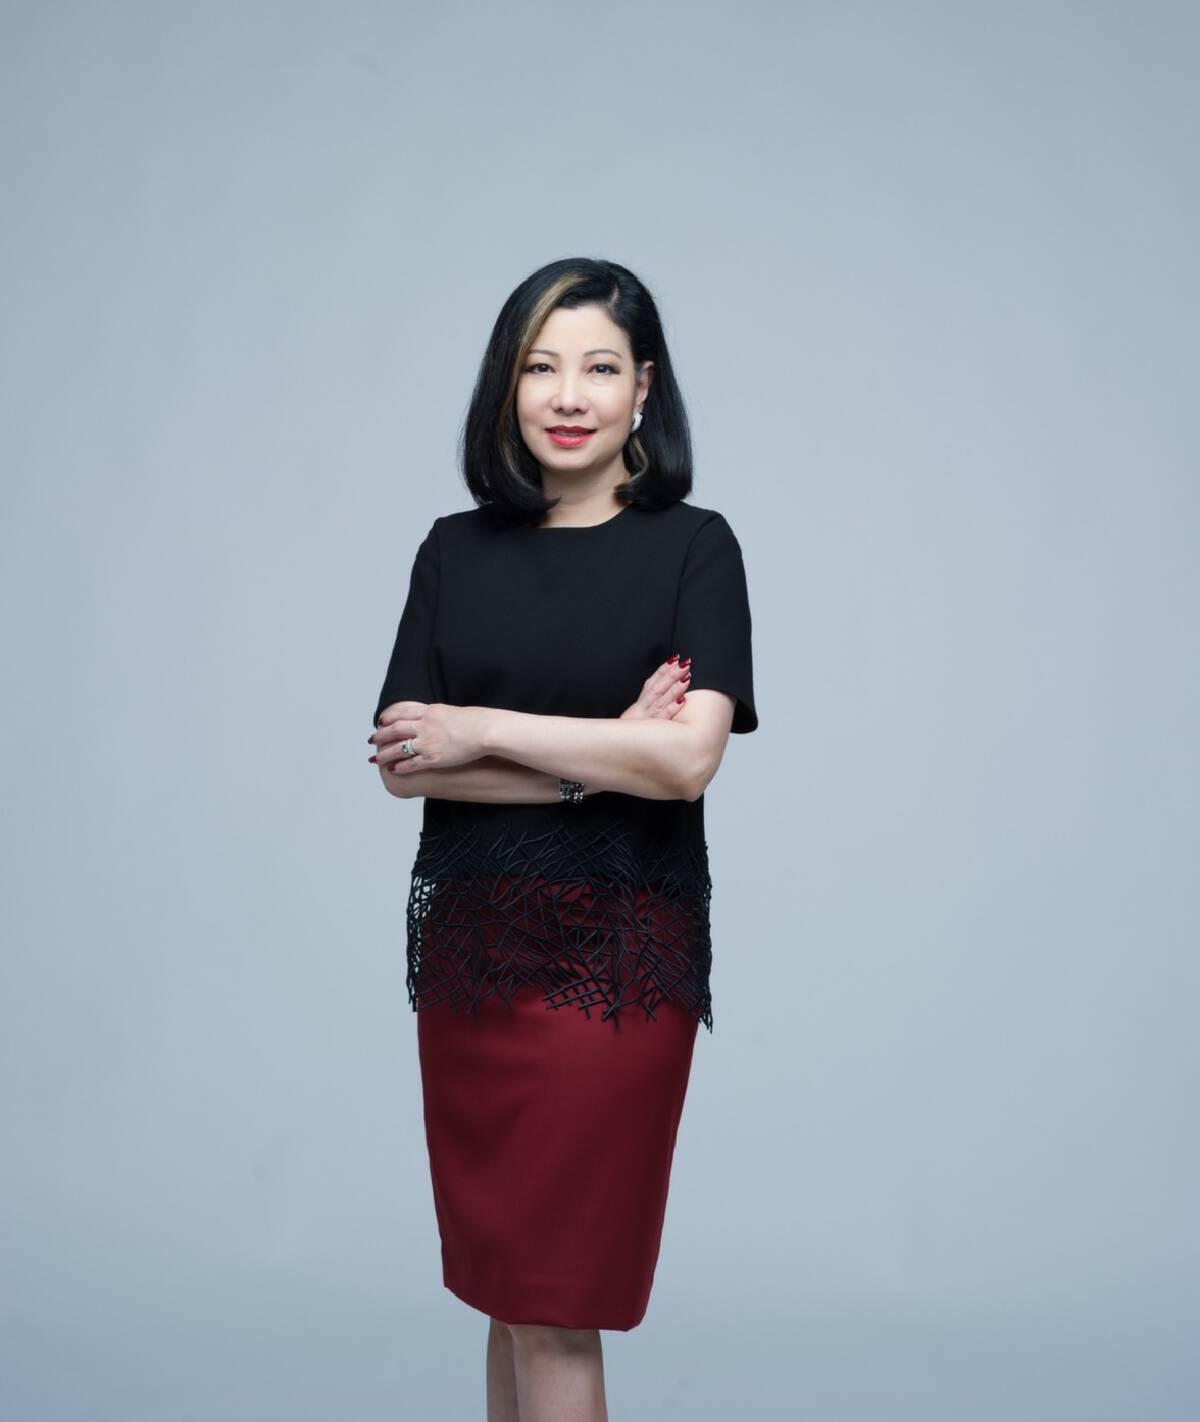 Ms. Chadatip Chutrakul, Chief Executive Officer of Siam Piwat Group